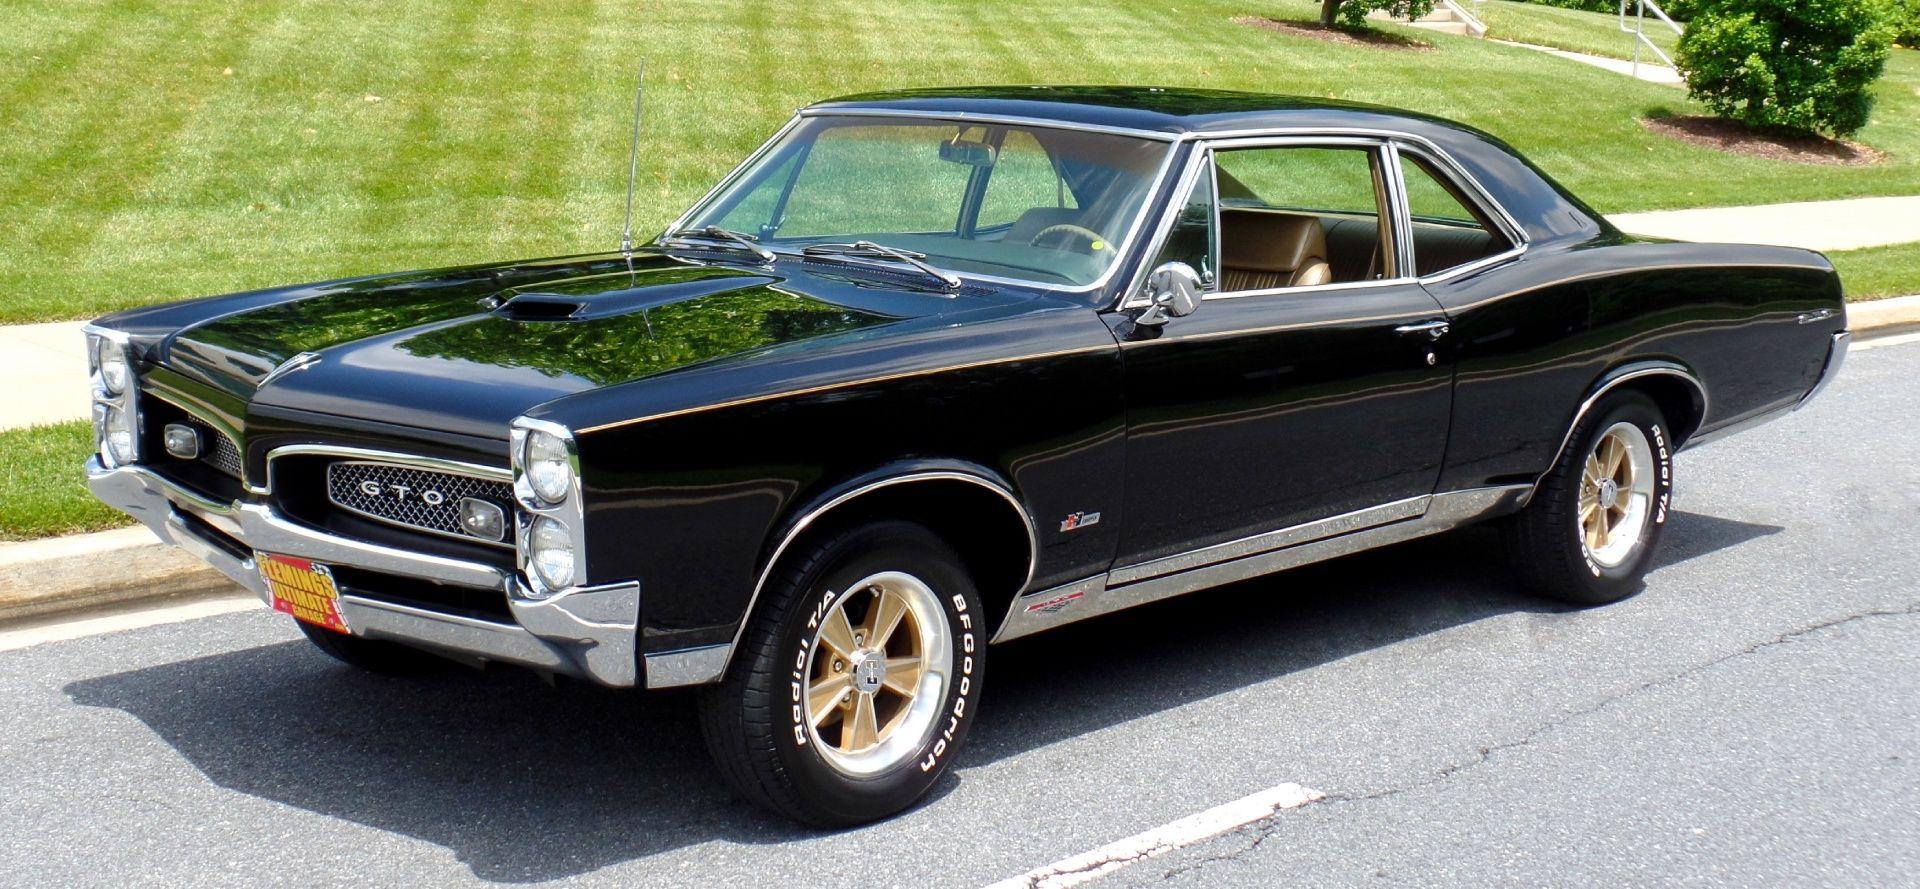 Sale | Flemings Ultimate Garage - :: 1967 Pontiac GTO H.O. - Classi ...